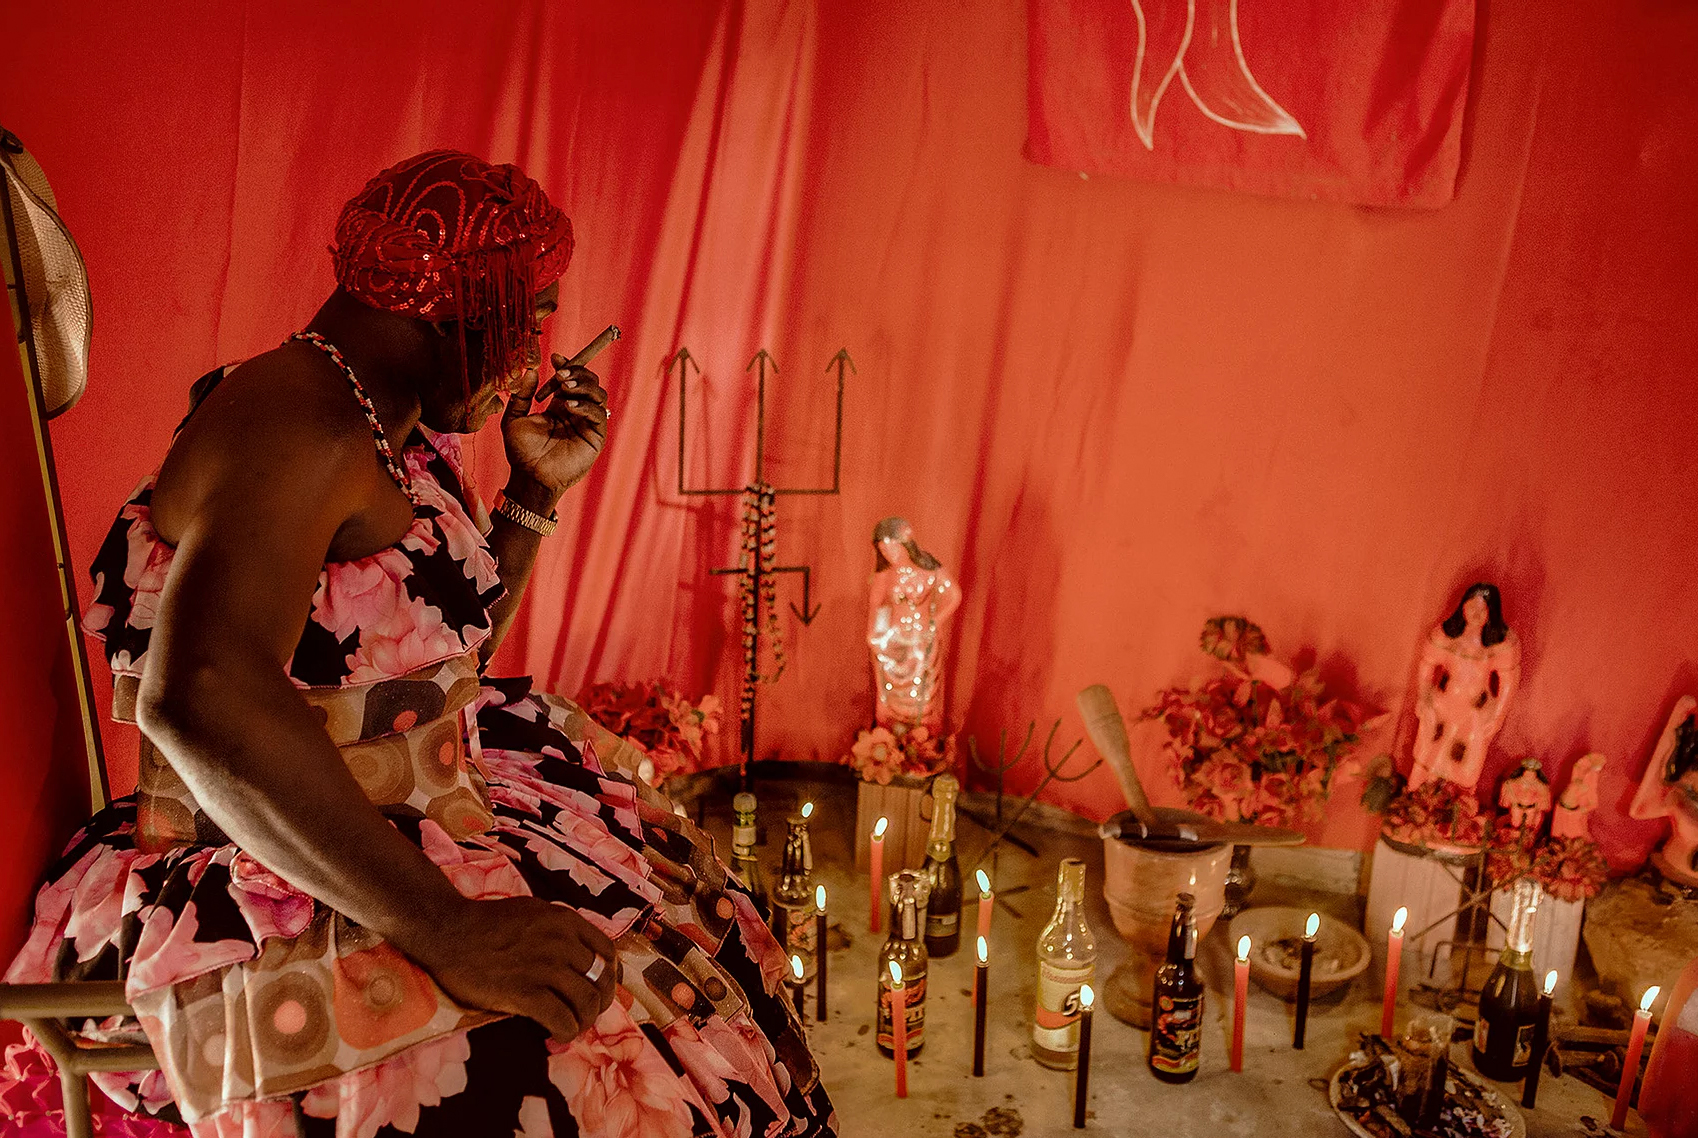 color photo by Alex Almeida from Brazil Tropical light. ceremony. ritual.